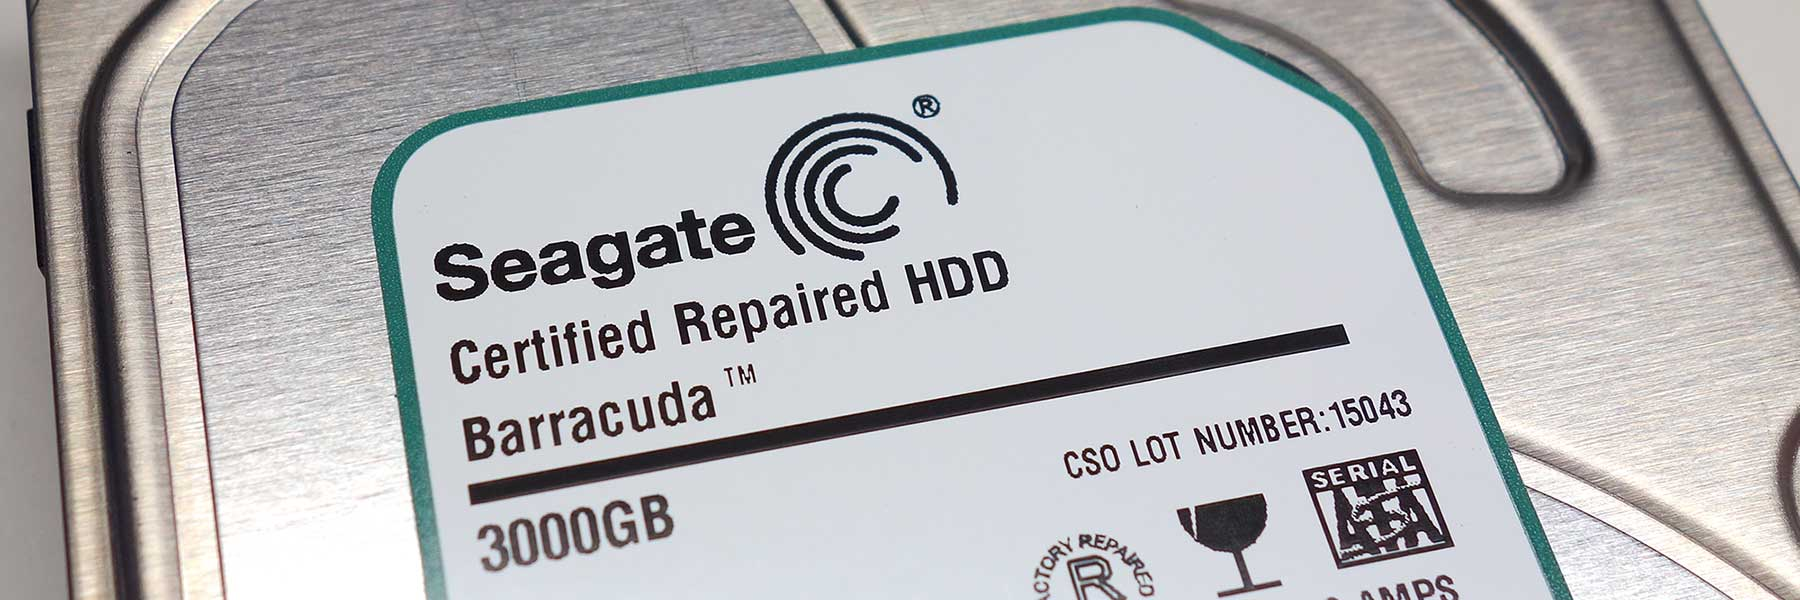 Seagate HDD RMA